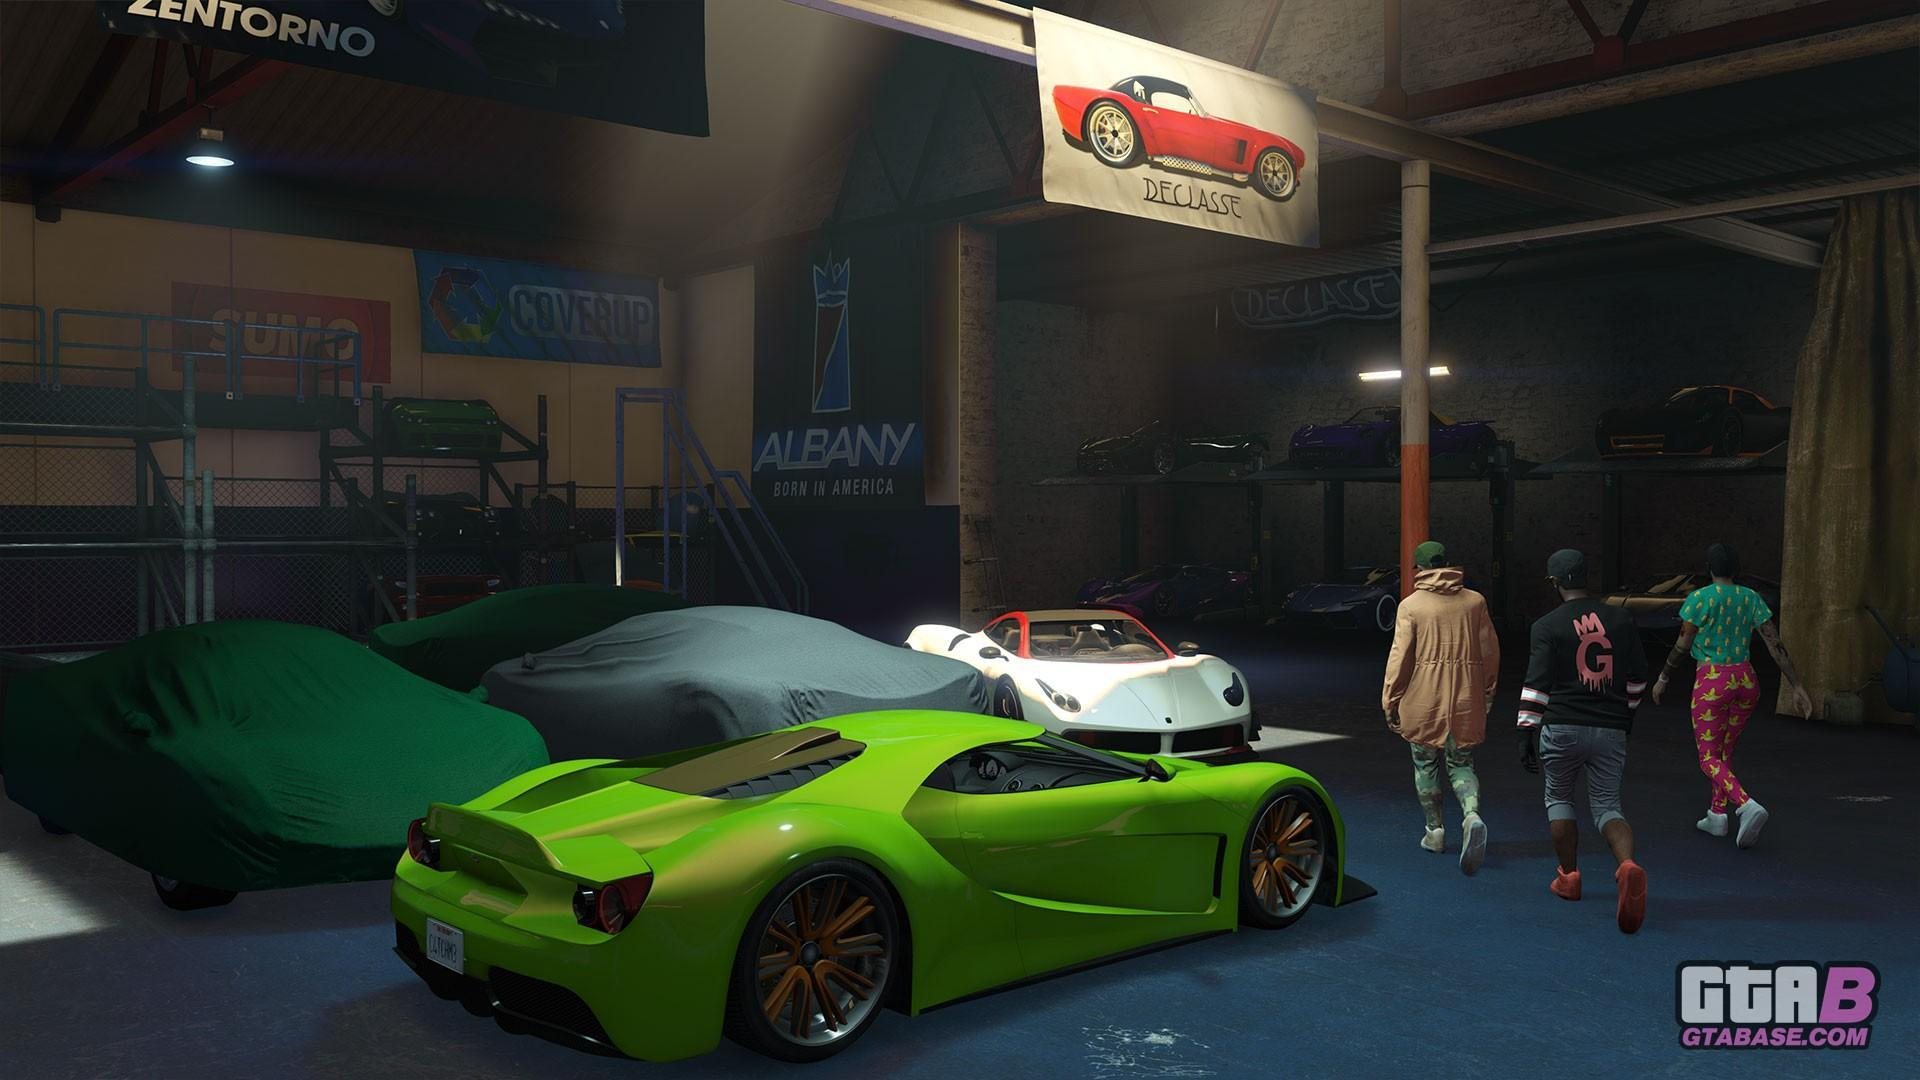 Vehicle Warehouses Gta Online Property Types Gta V Guides Faqs Grand Theft Auto V